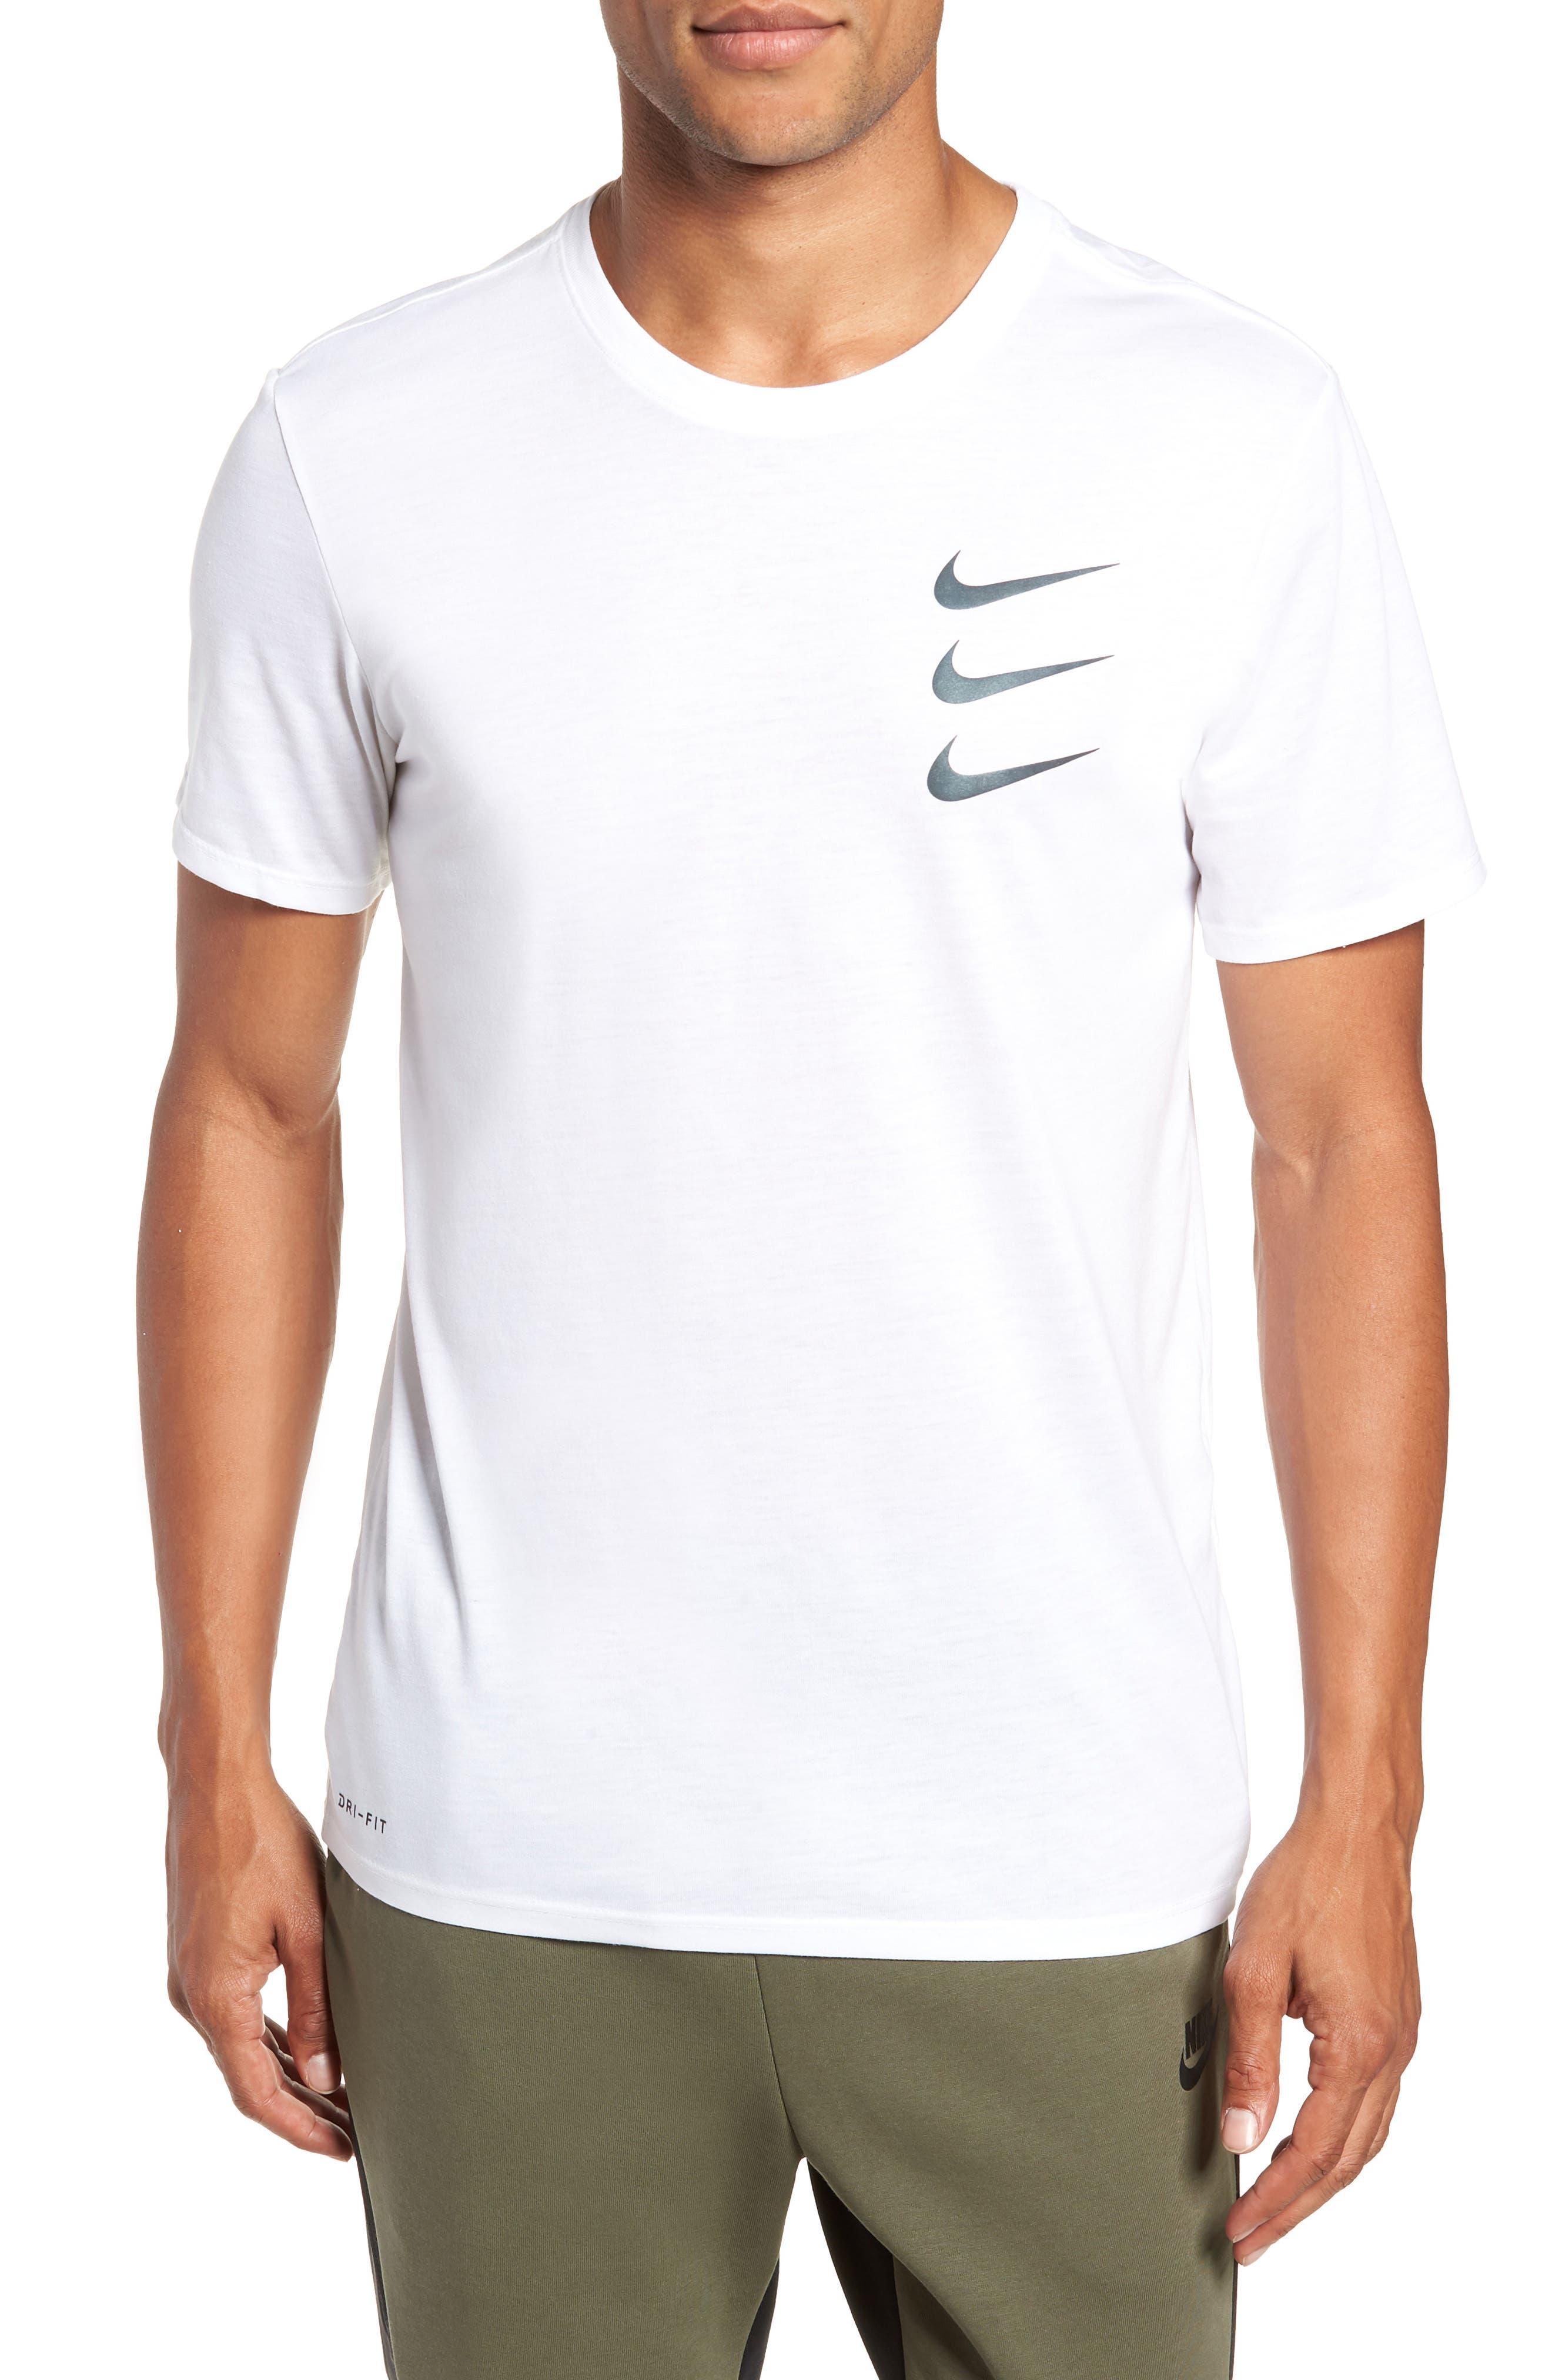 Dry Running Division T-Shirt,                             Main thumbnail 1, color,                             WHITE/ GUNSMOKE